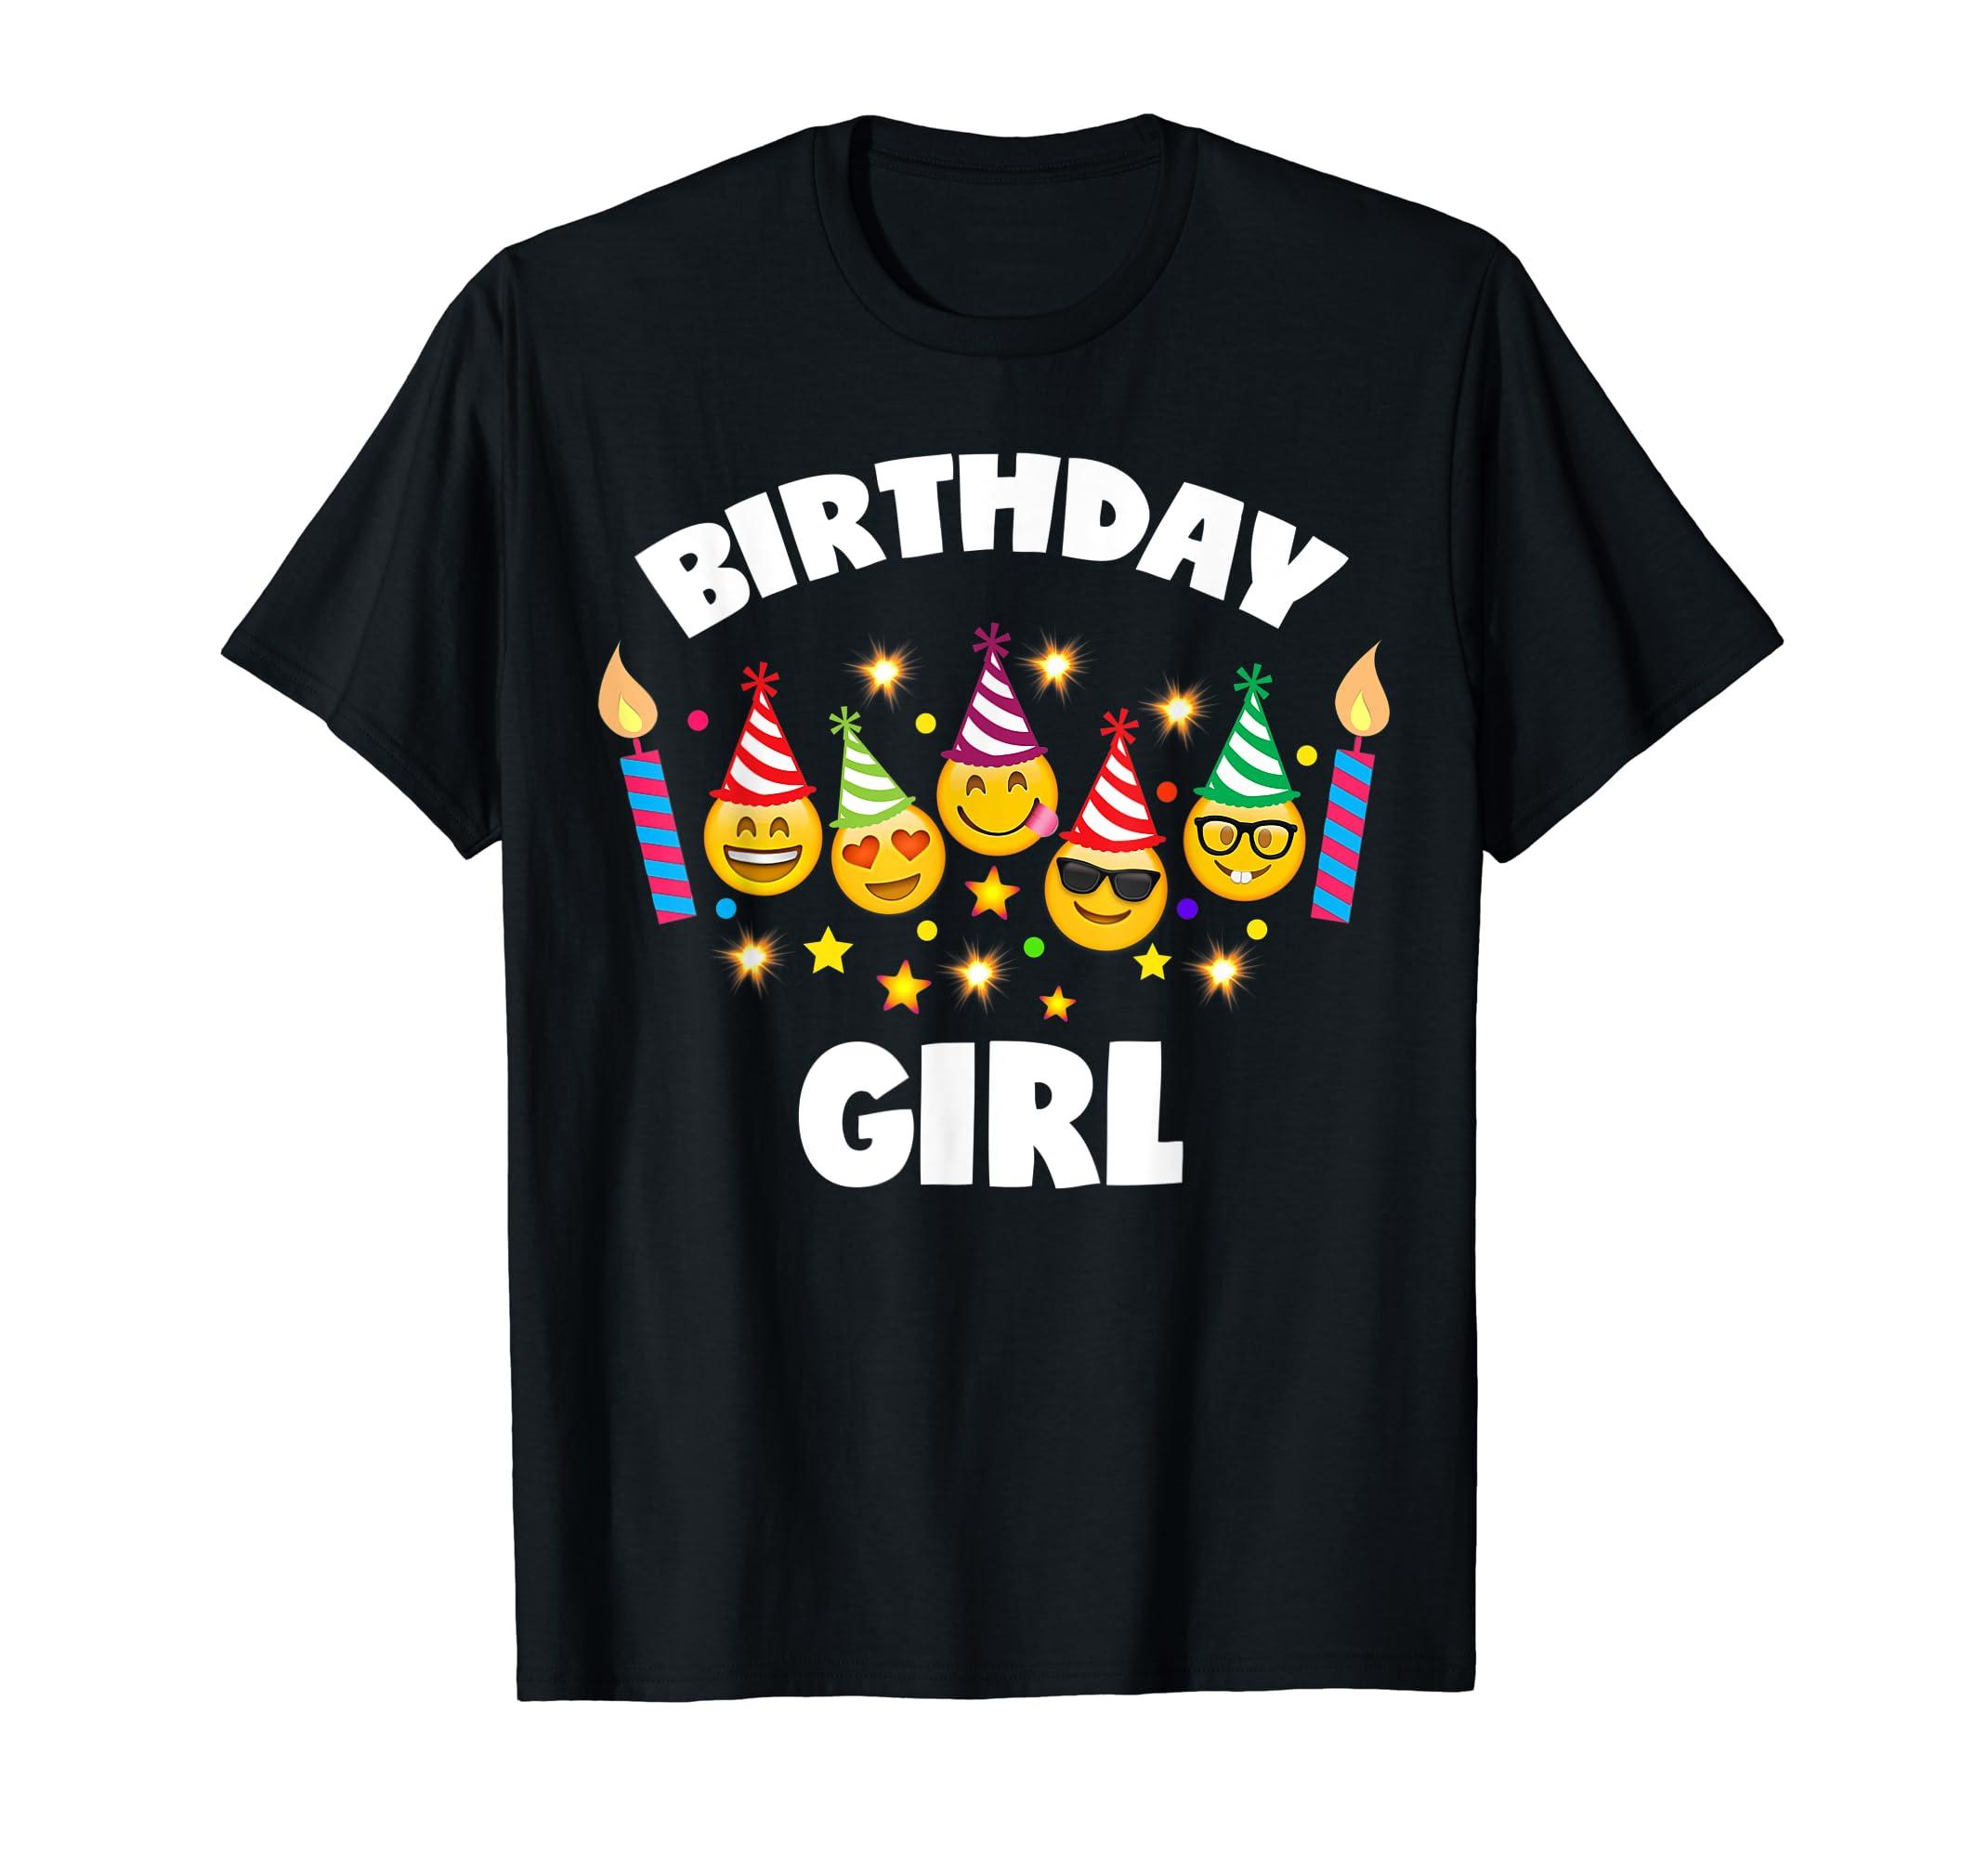 Amazon Emoji Birthday Shirt For Girls Girl Toddlers Clothing